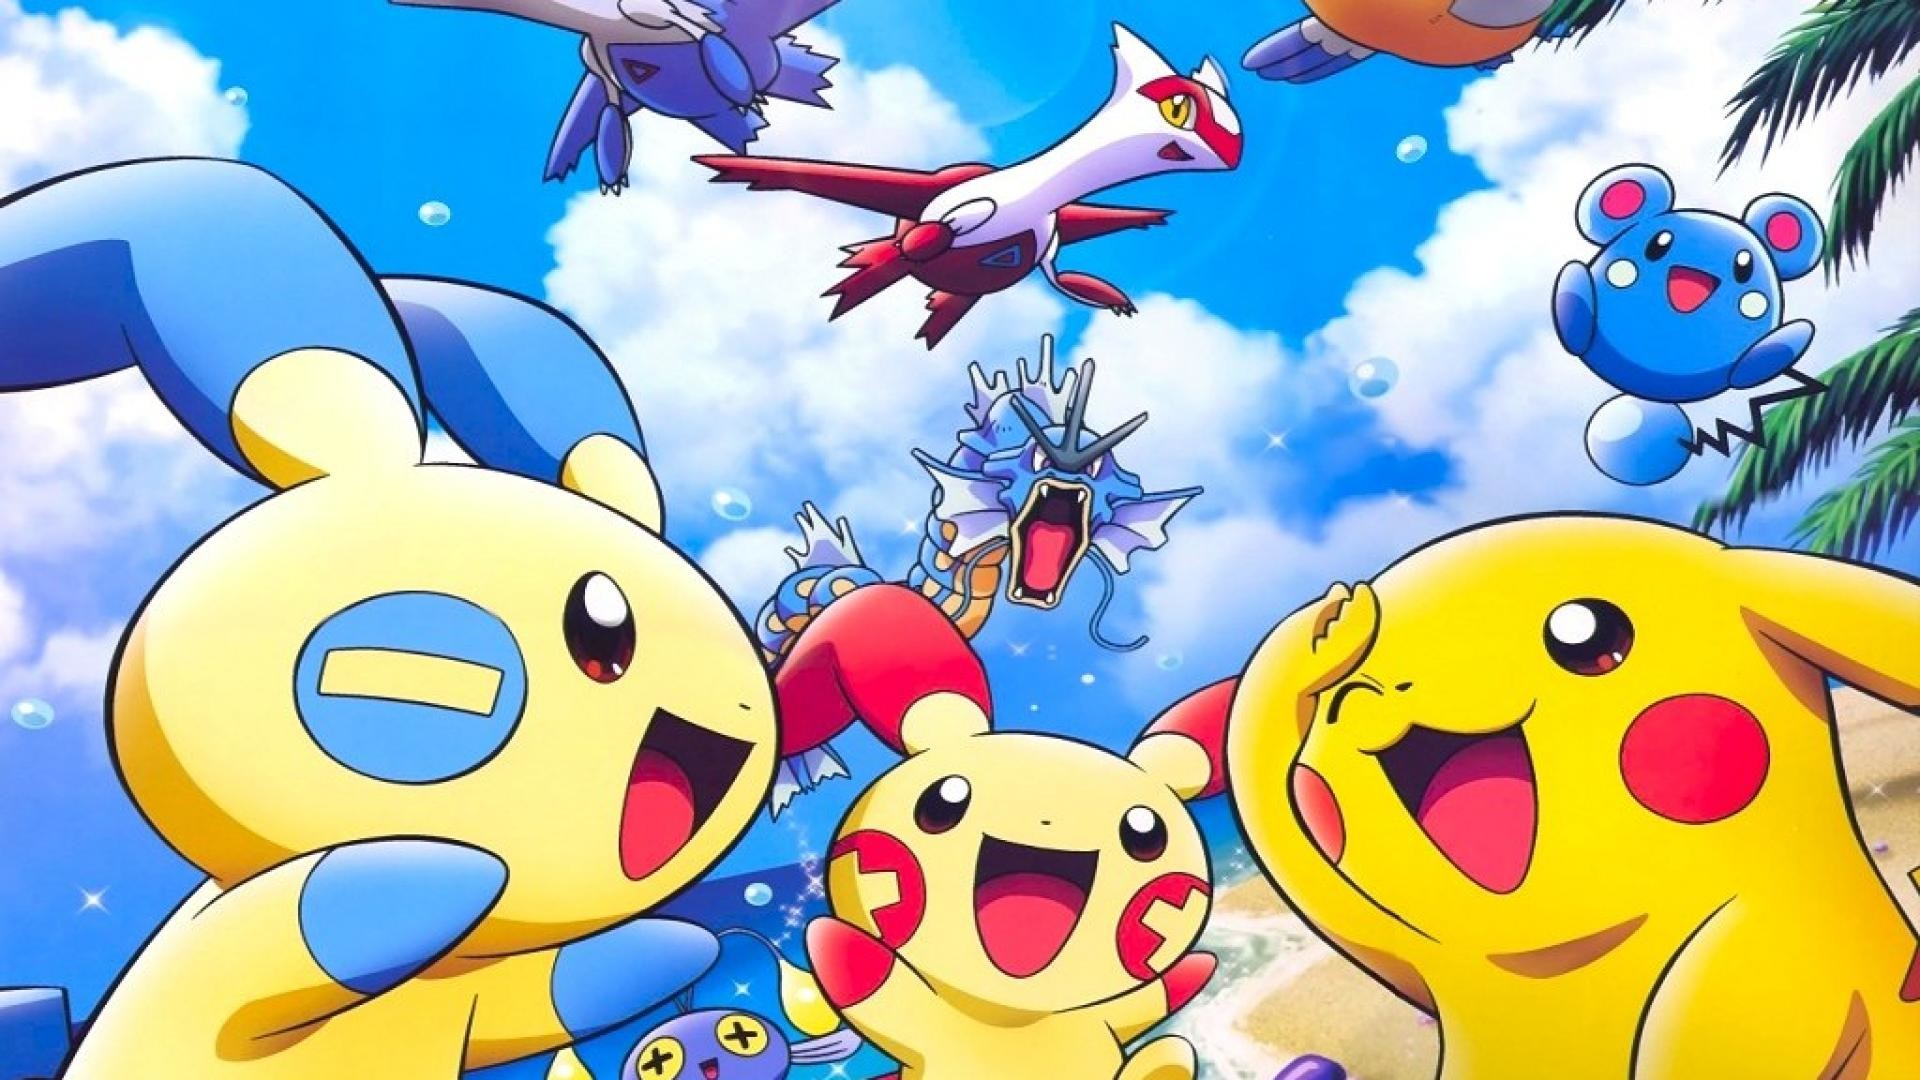 all pokemon background wallpaper desktop images background photos  download free samsung iphone mac 1920×1080